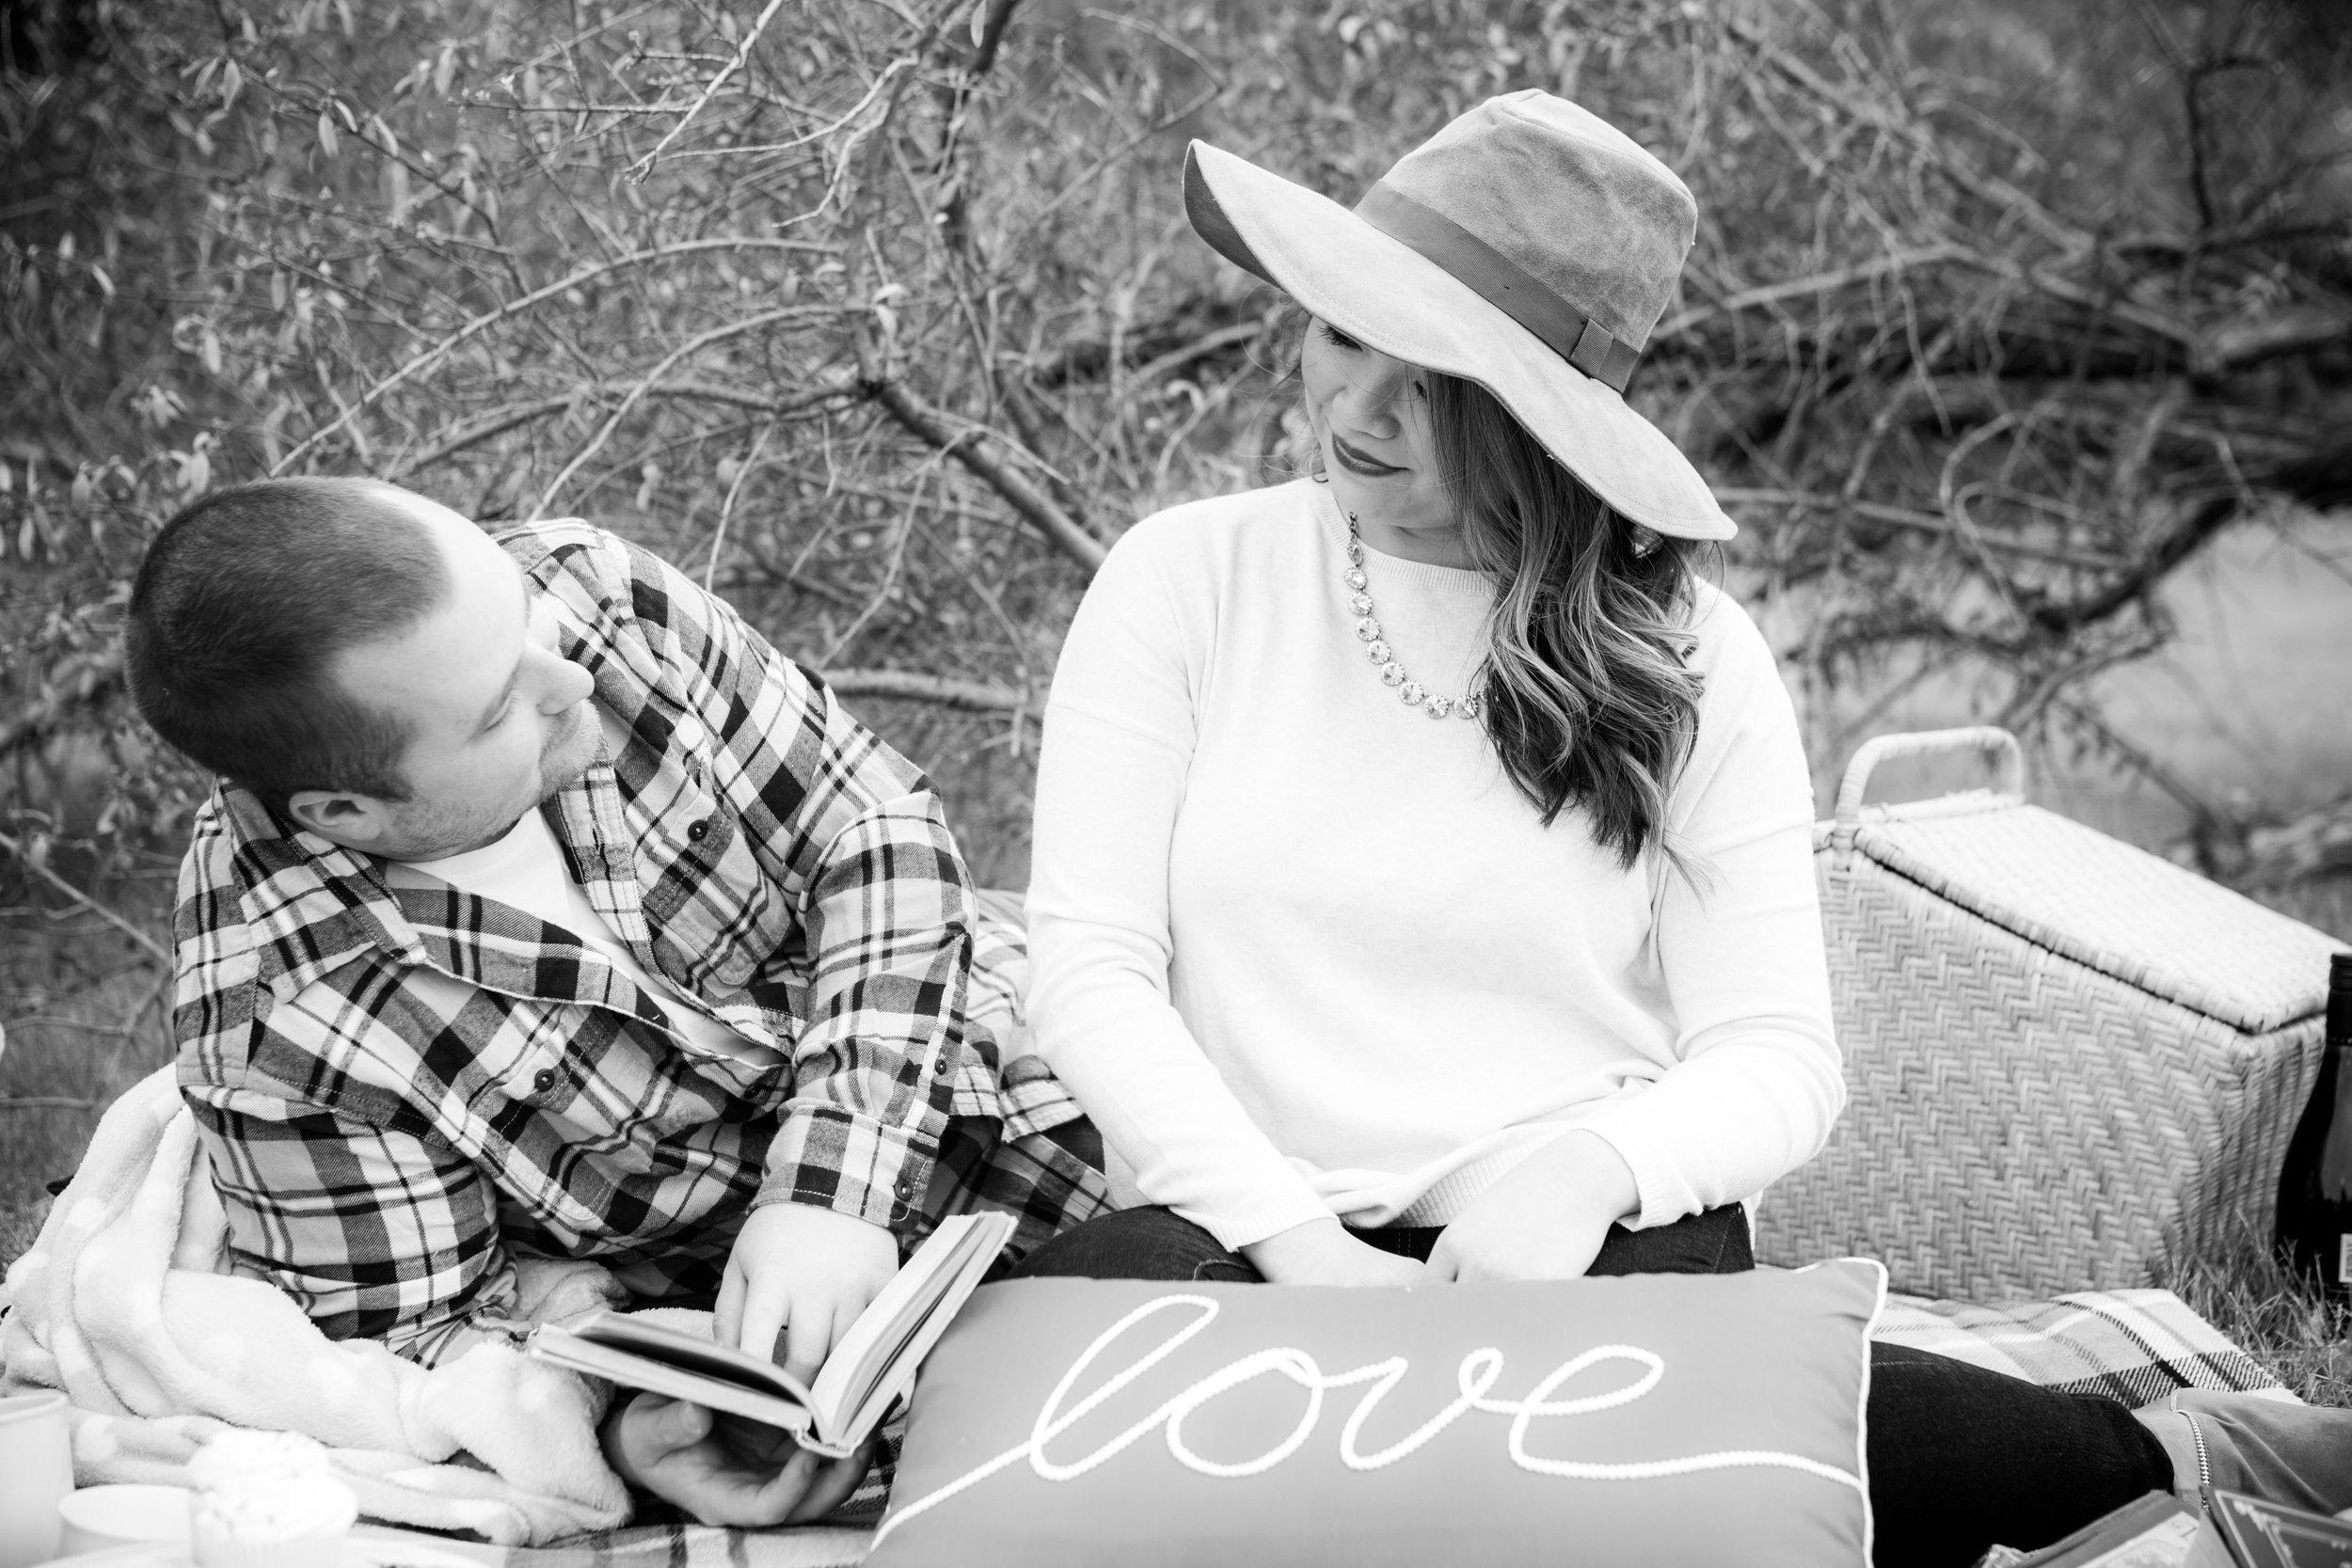 Experienced Edmonton Photographer - specializing in wedding photography, engagement photography, boudoir photography, portrait photography - try before you buy